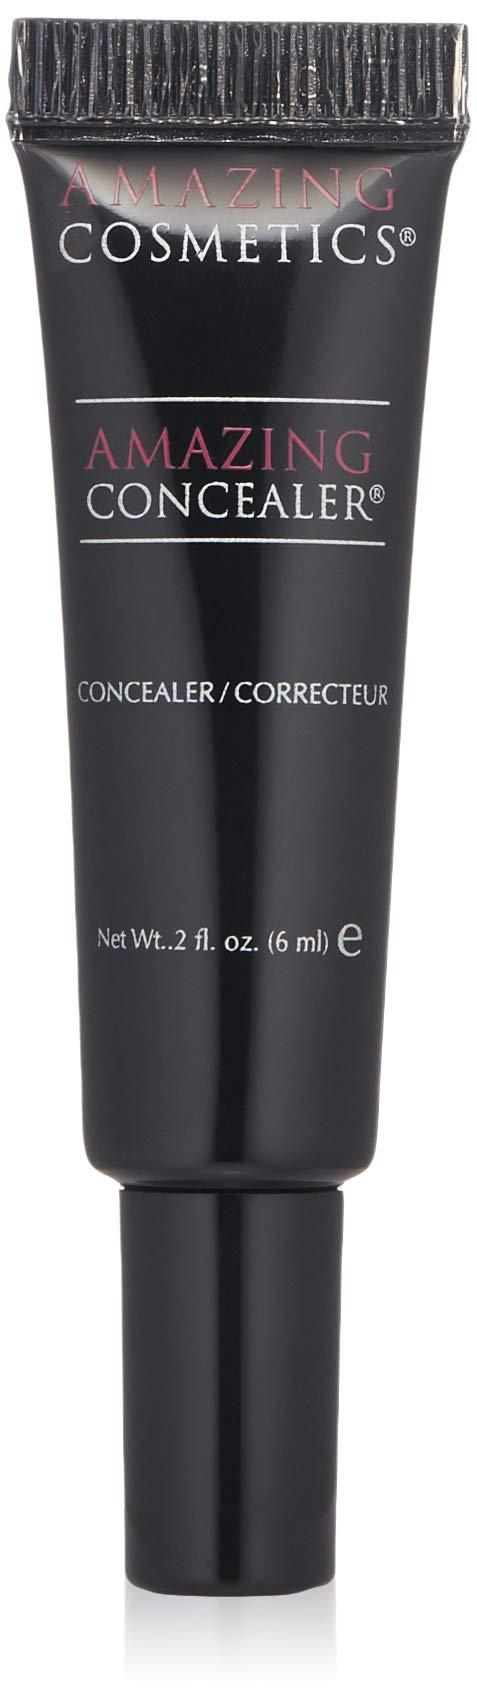 AmazingCosmetics Amazing Concealer, multipurpose full coverage concealer, Medium Beige by AmazingCosmetics